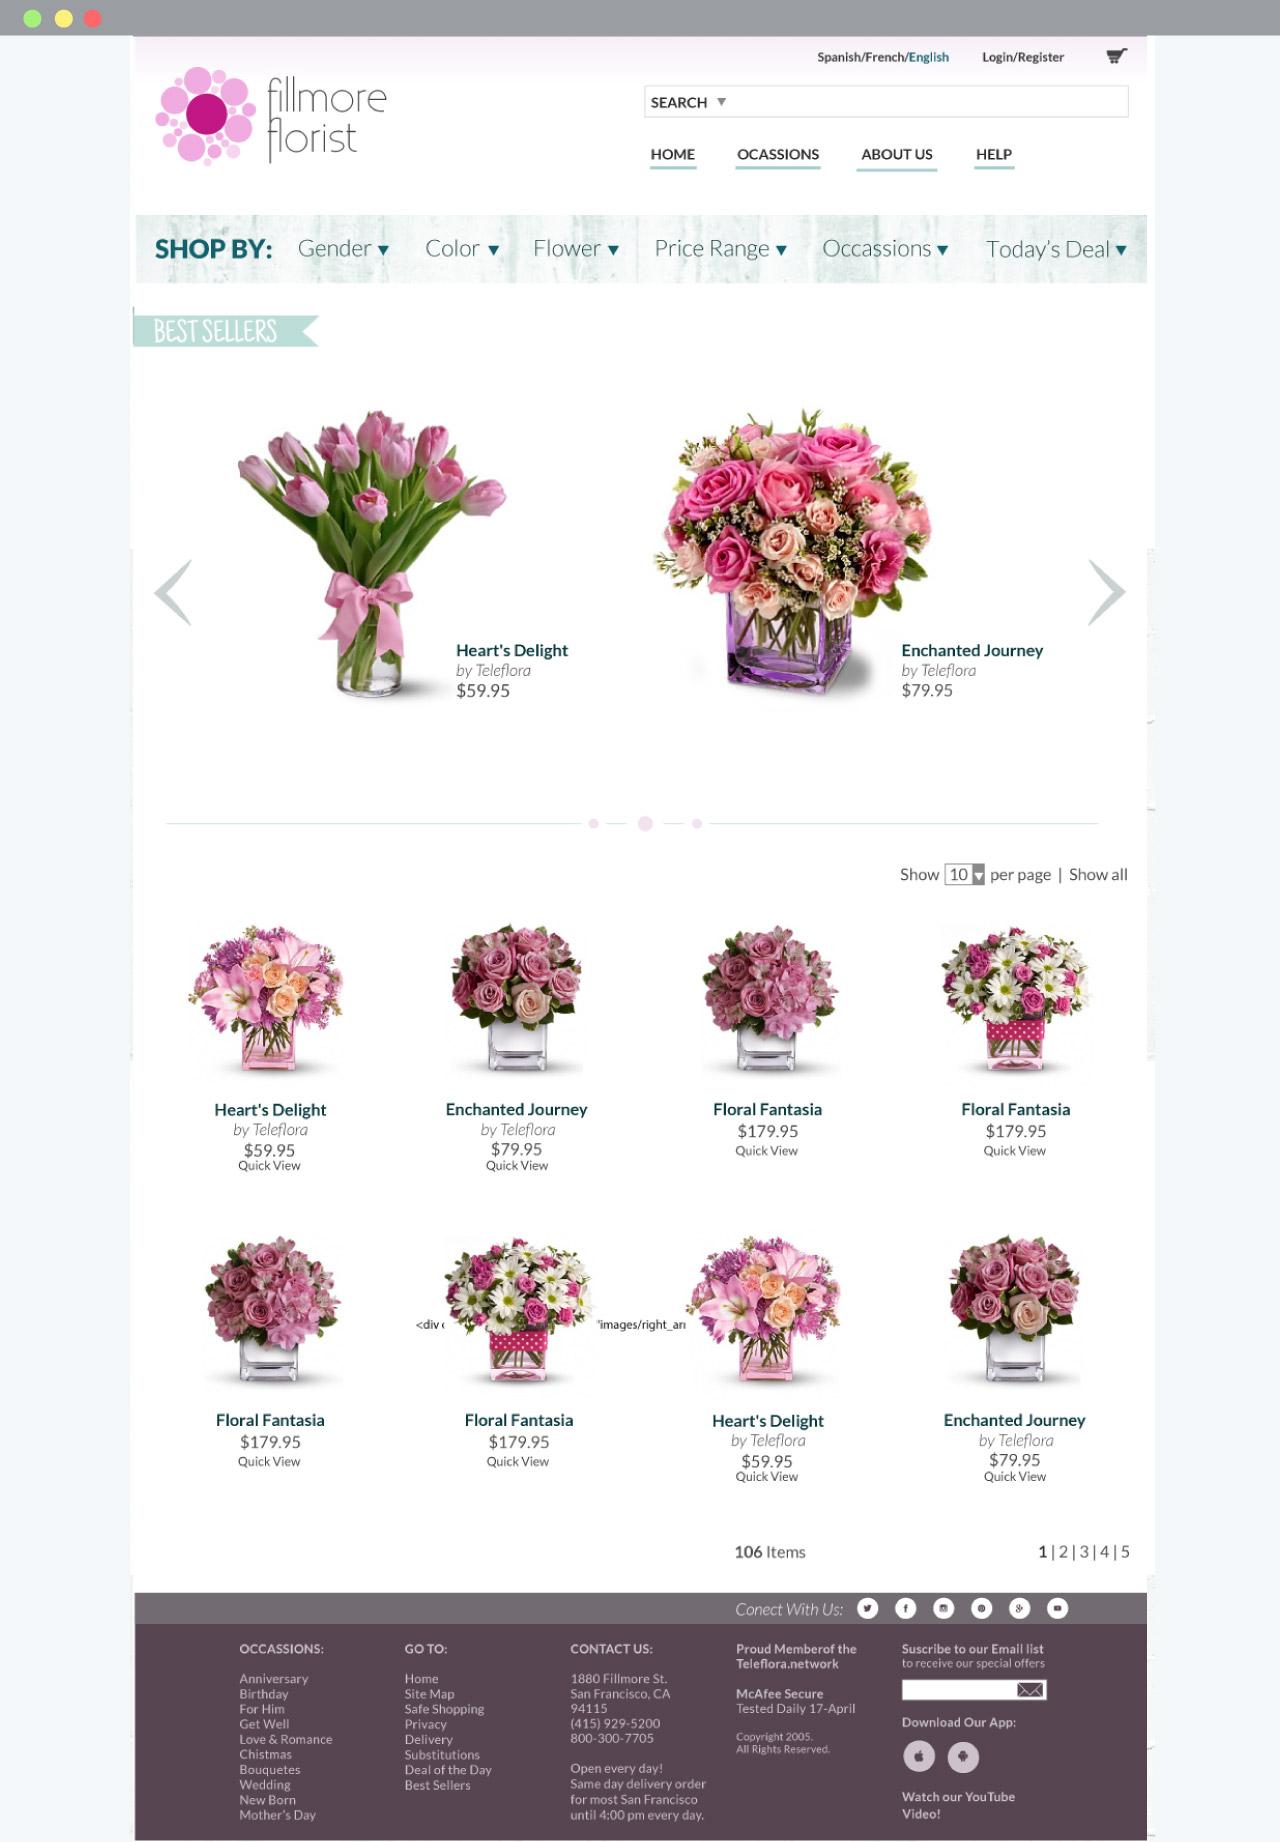 Fillmore Florist catalog page